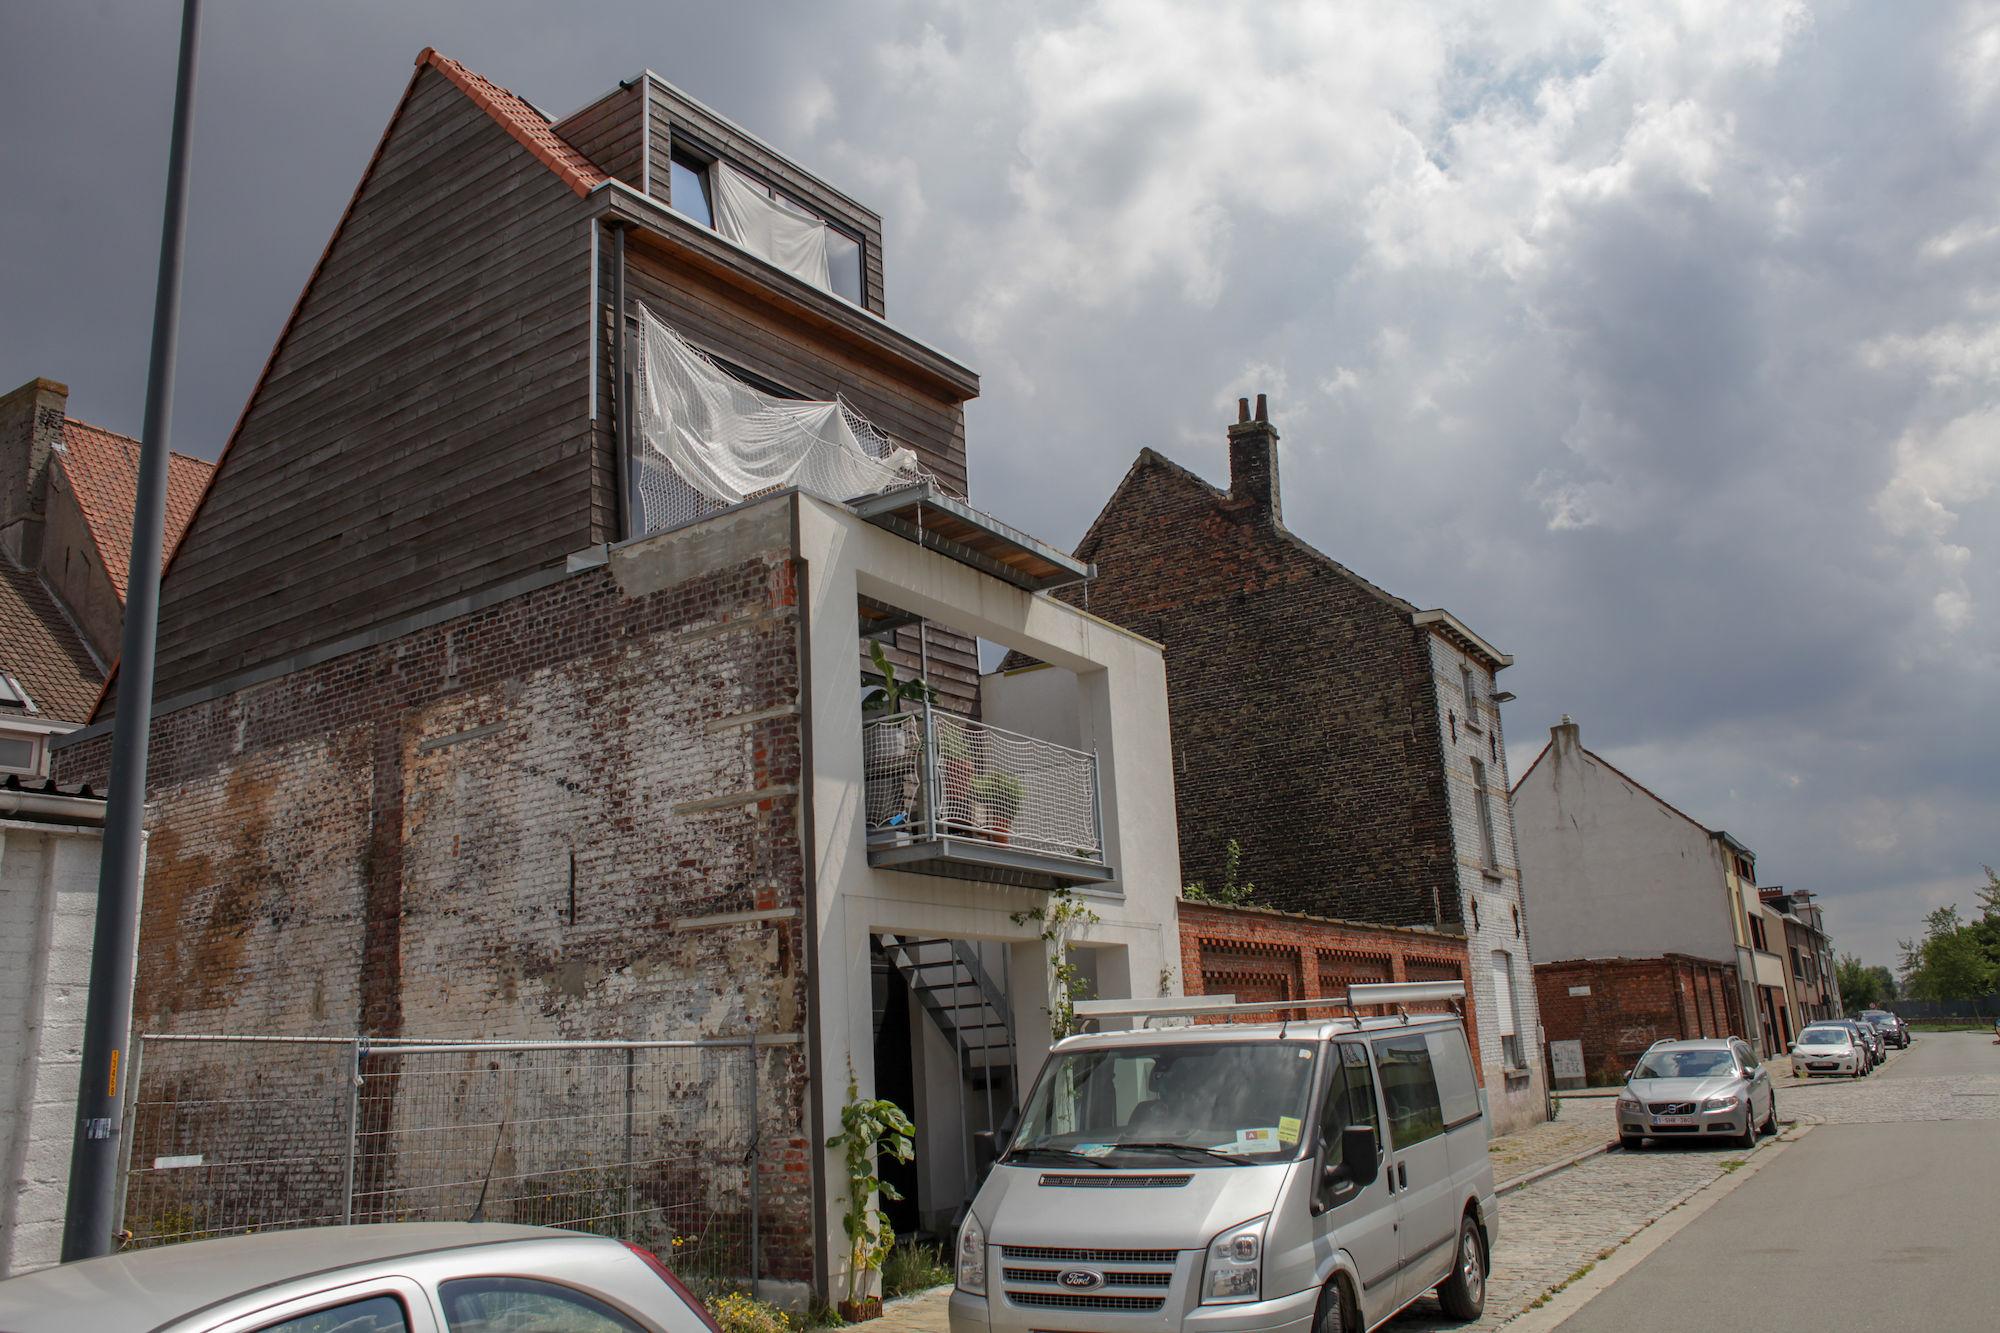 2019-07-02 Muide Meulestede prospectie Wannes_stadsvernieuwing_IMG_0393-3.jpg